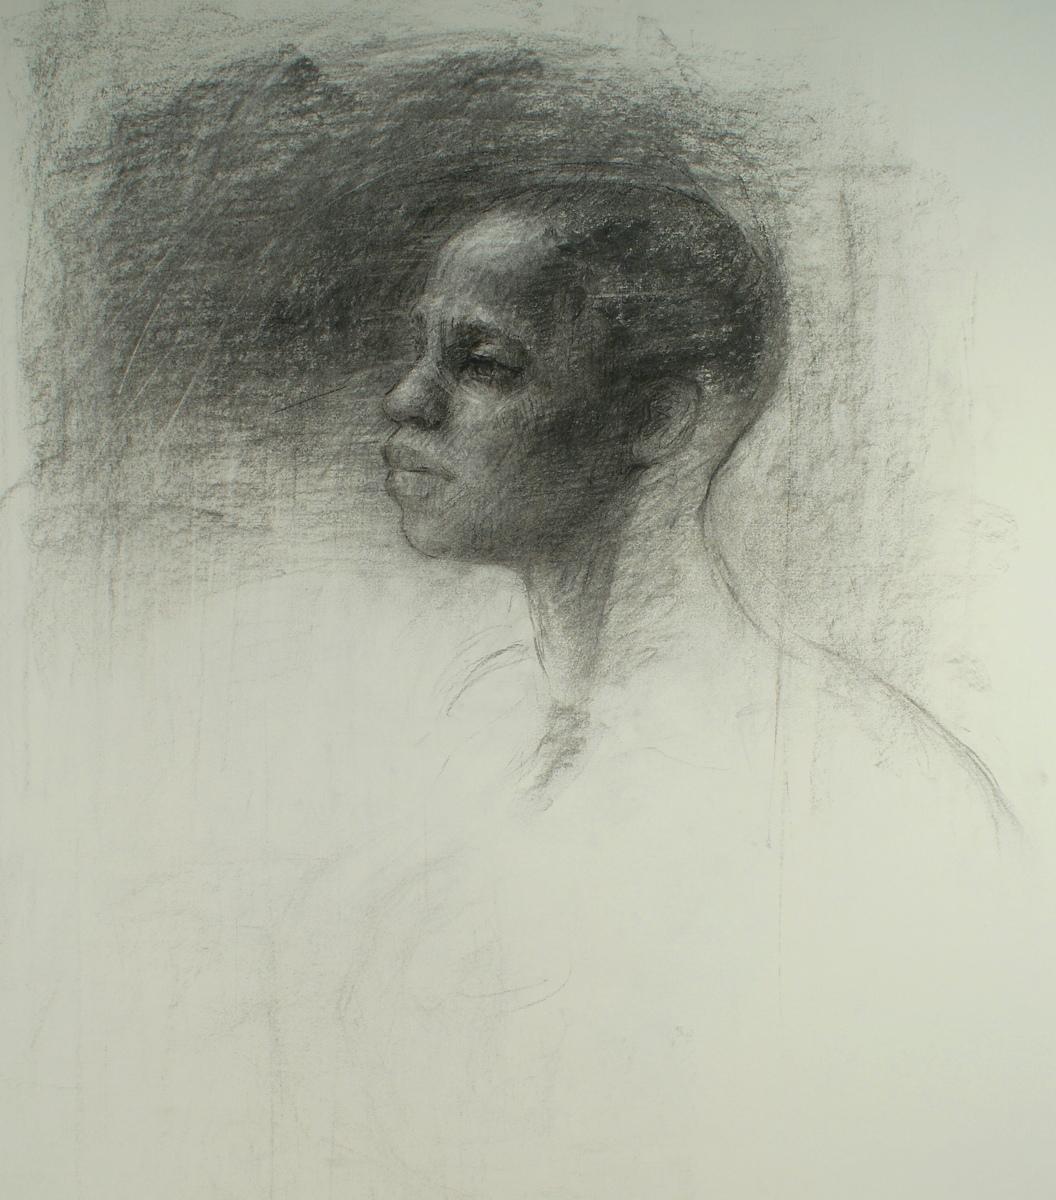 Profile Study (large view)